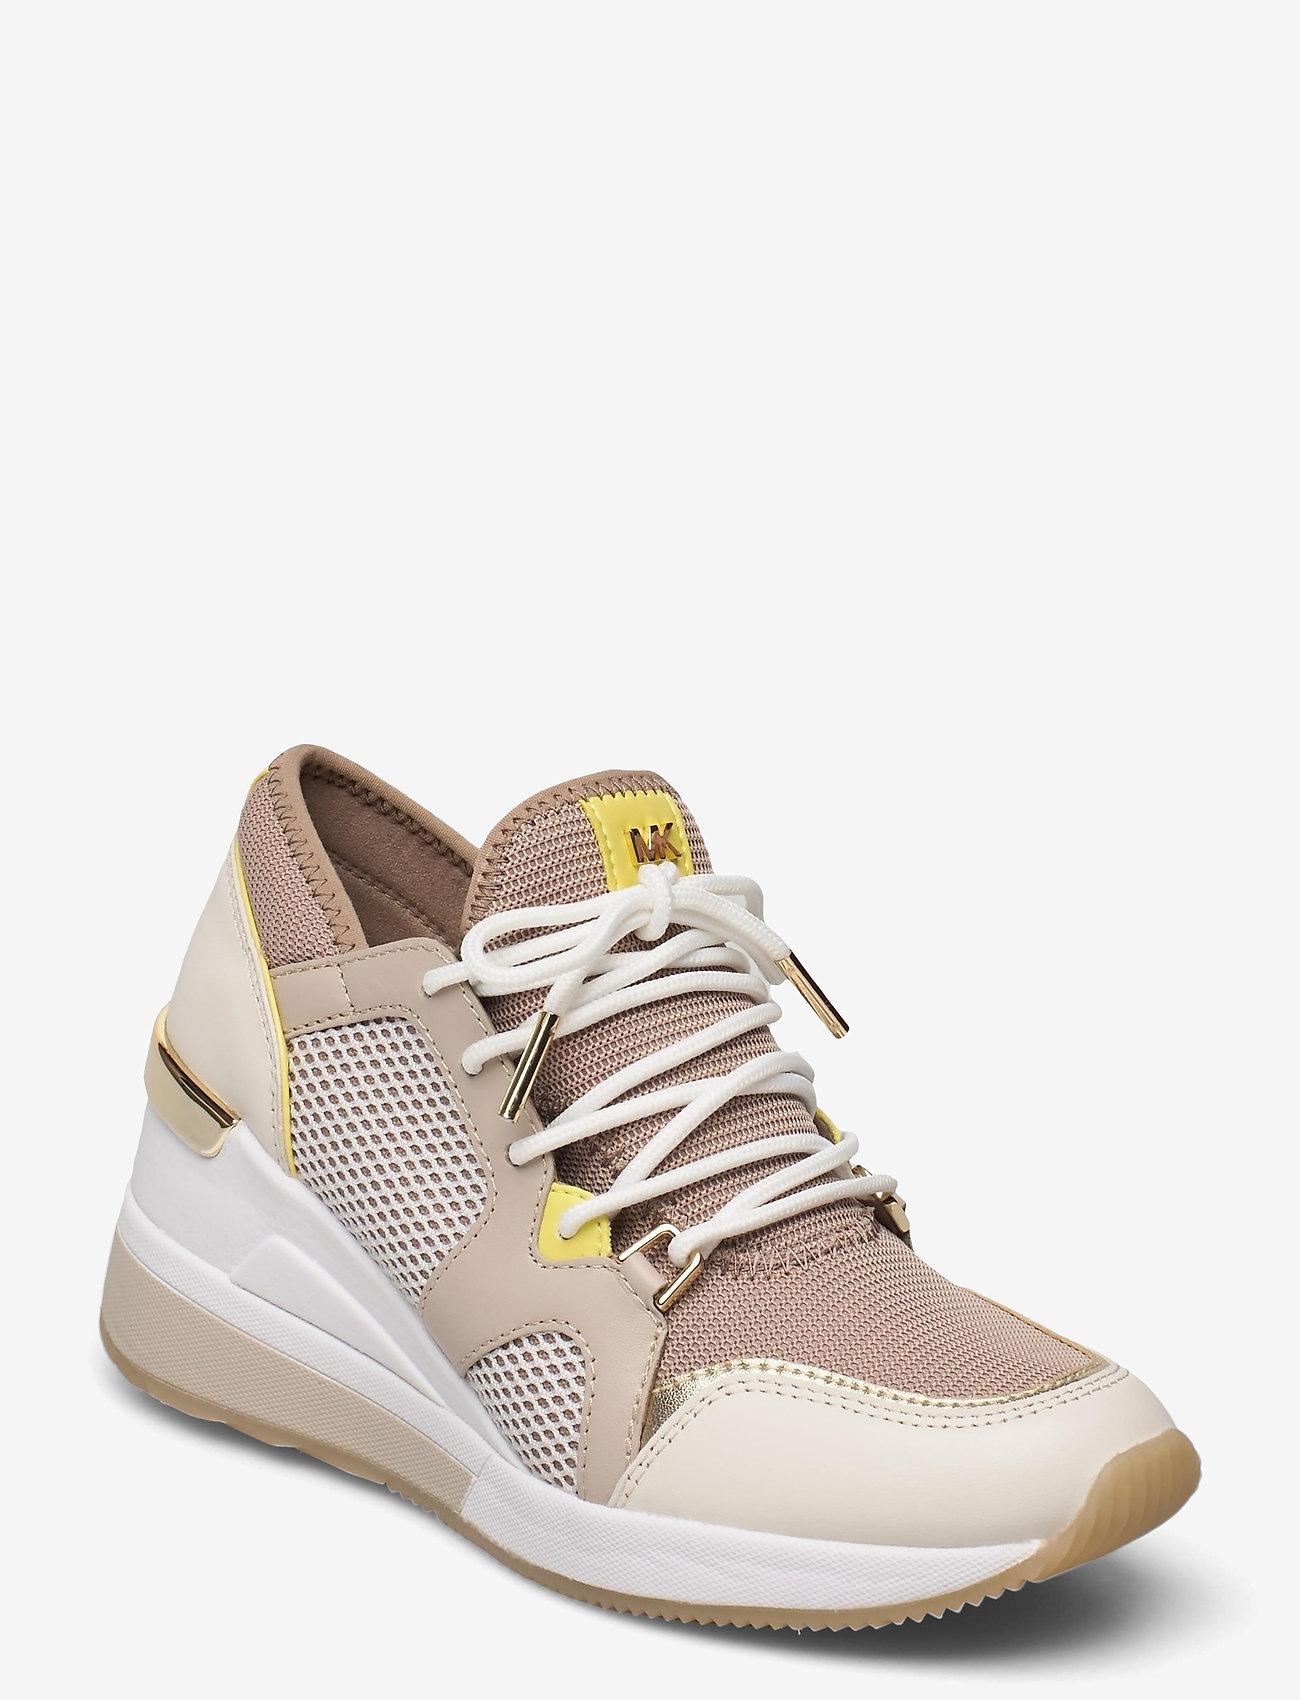 Michael Kors - LIV TRAINER - lage sneakers - truffle mlti - 0